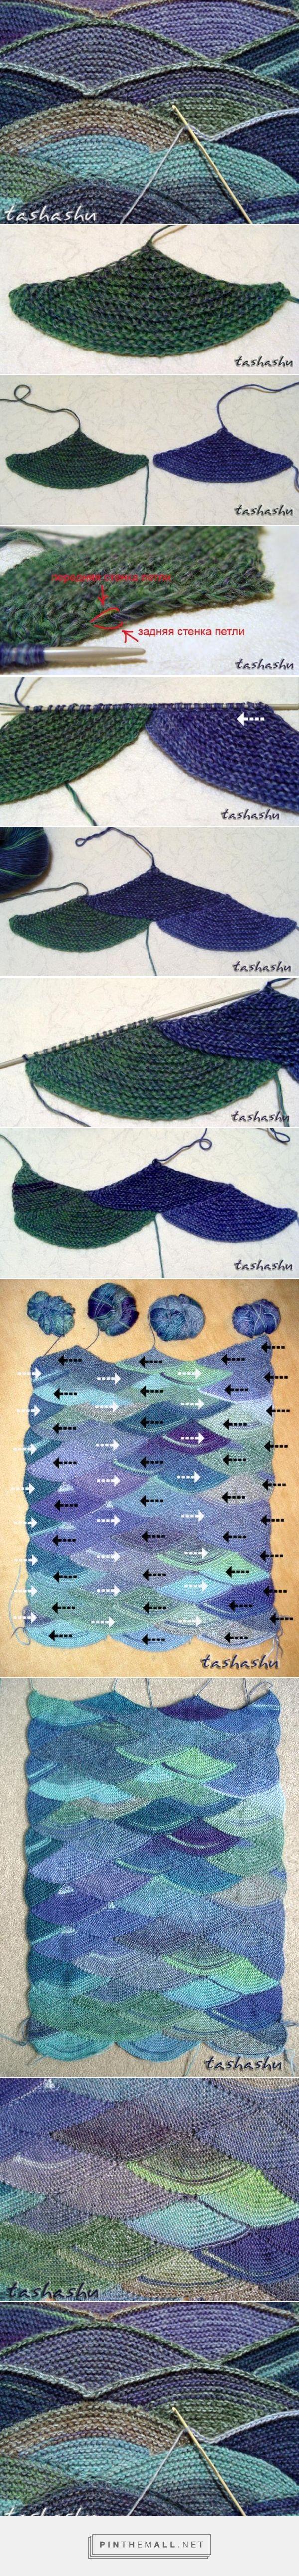 Knitted blanket: shell-shaped blocks. Lovely colour scheme ~~ http://www.liveinternet.ru/users/dakka_-_l/rubric/1677886/ ~~ LiveInternet - created on 2015-02-25 15:44:26